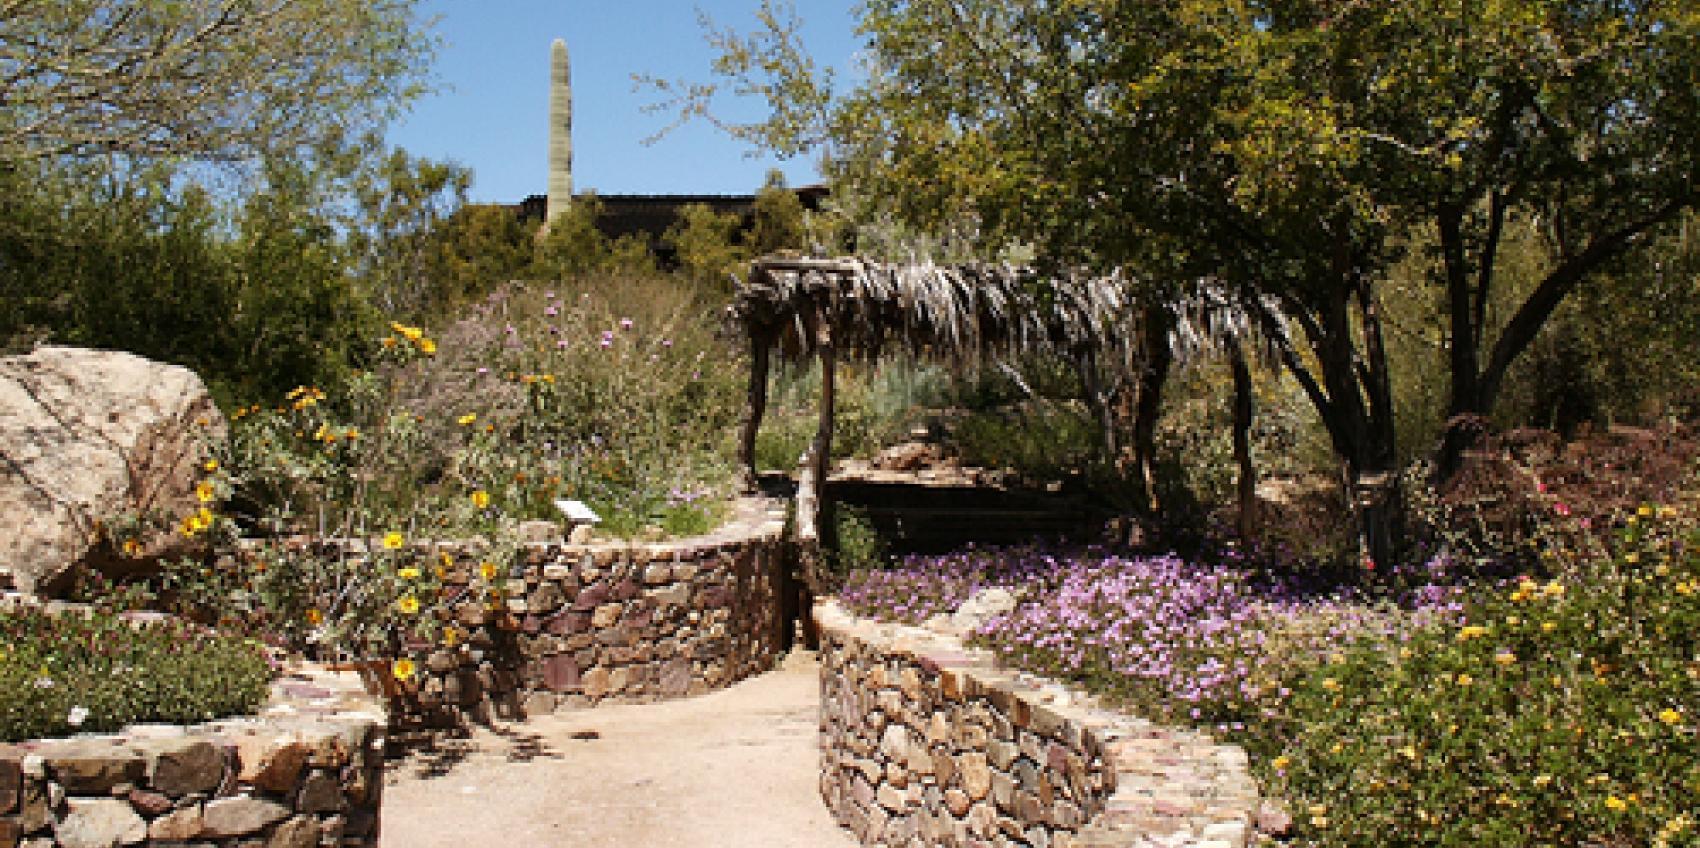 Arizona-Sonora Desert Museum | American Public Gardens Association